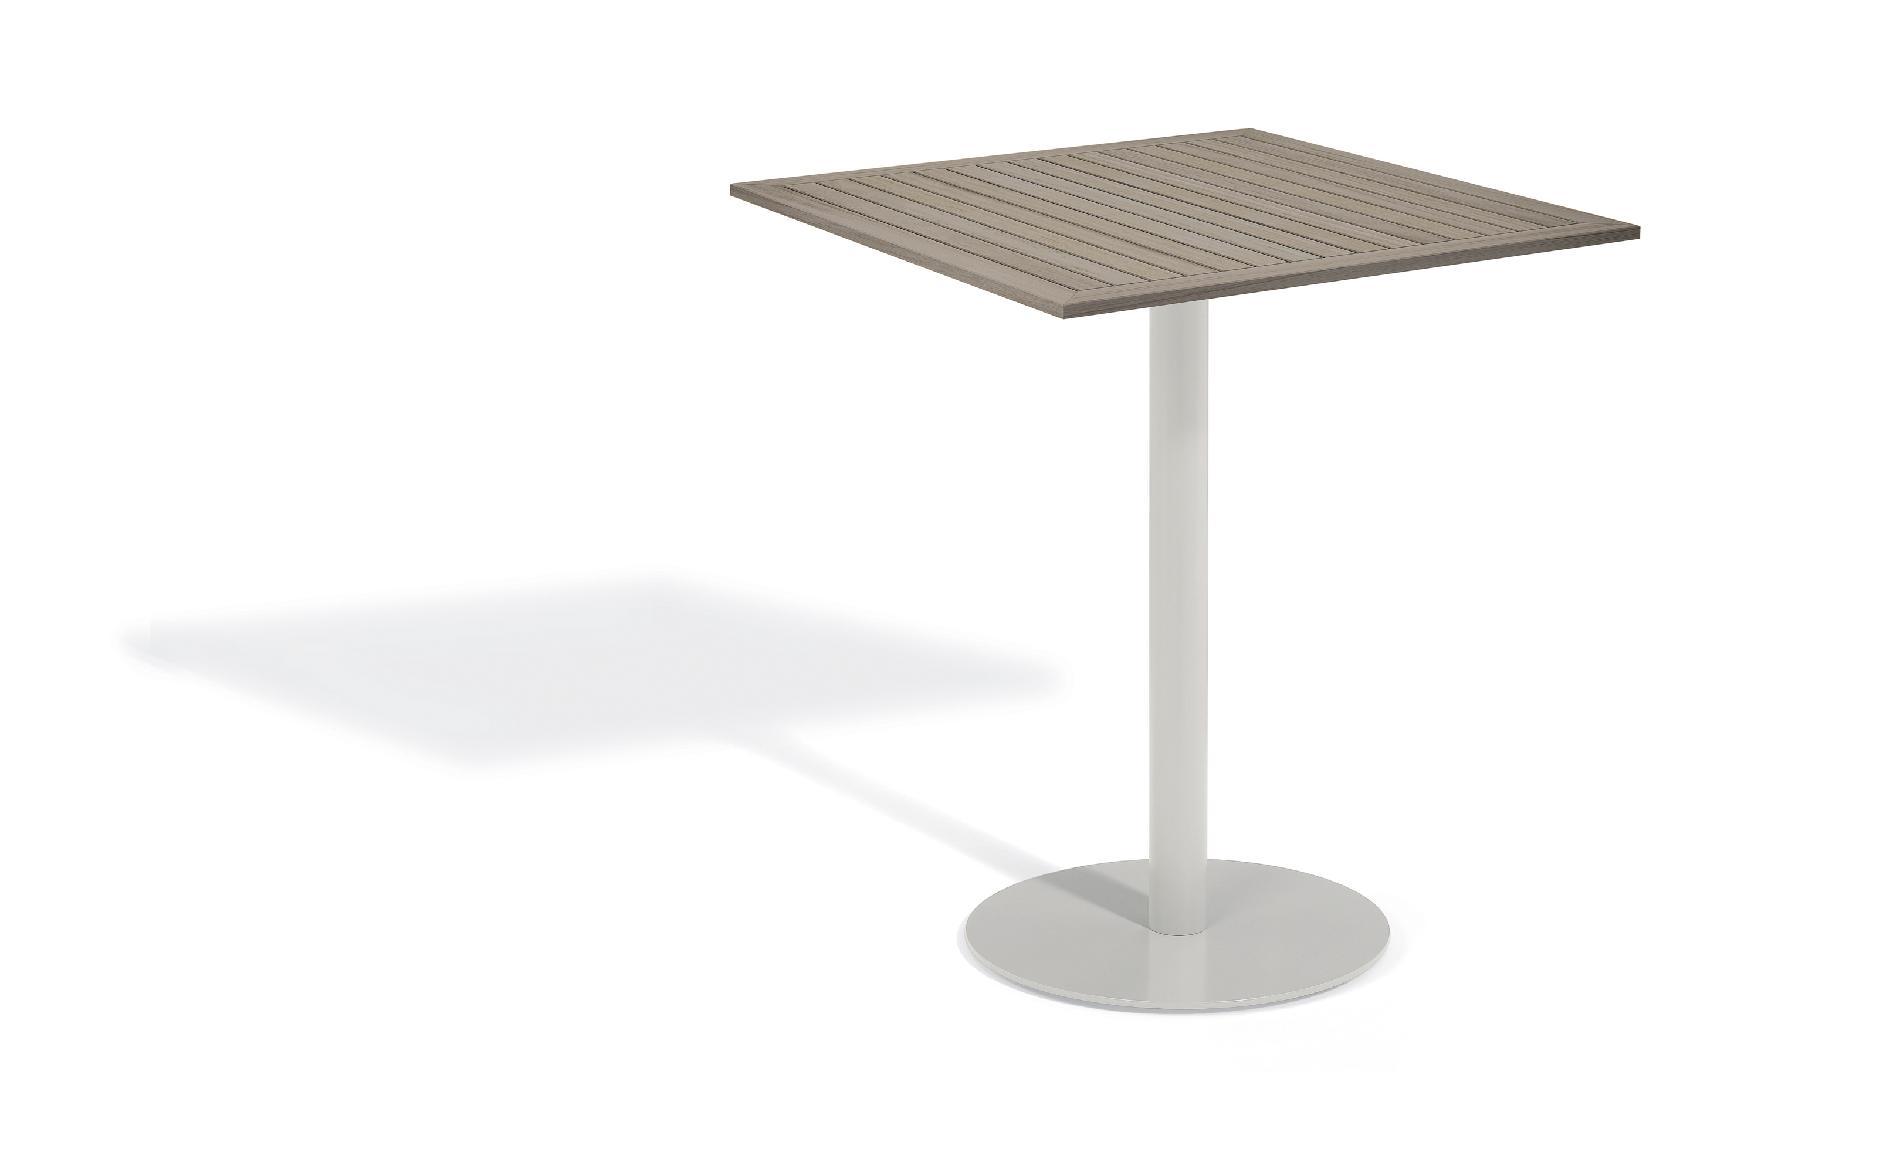 Oxford Garden Travira Commercial Grade 36'' Square Bar Table Tekwood Vintage